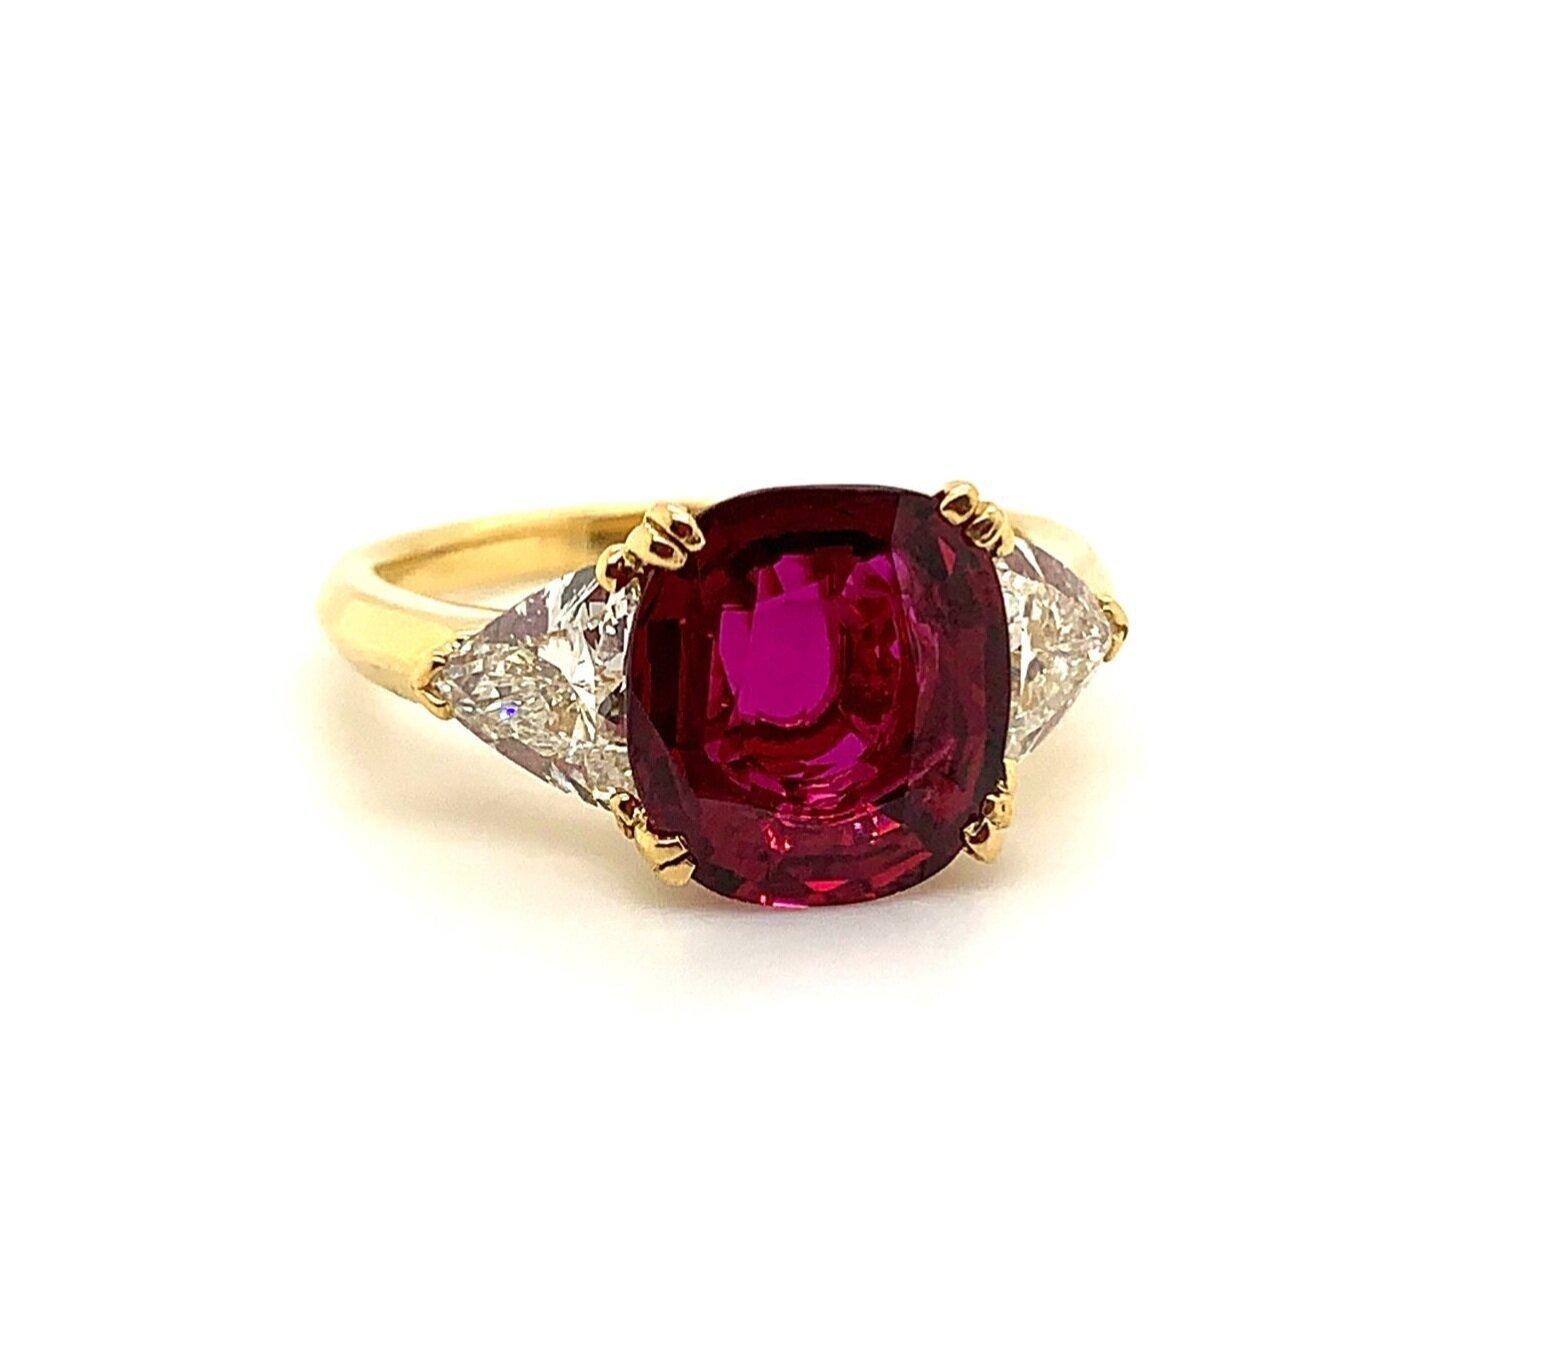 18K YG Ruby Diamond Ring  Est. US$ 13,000-15,000